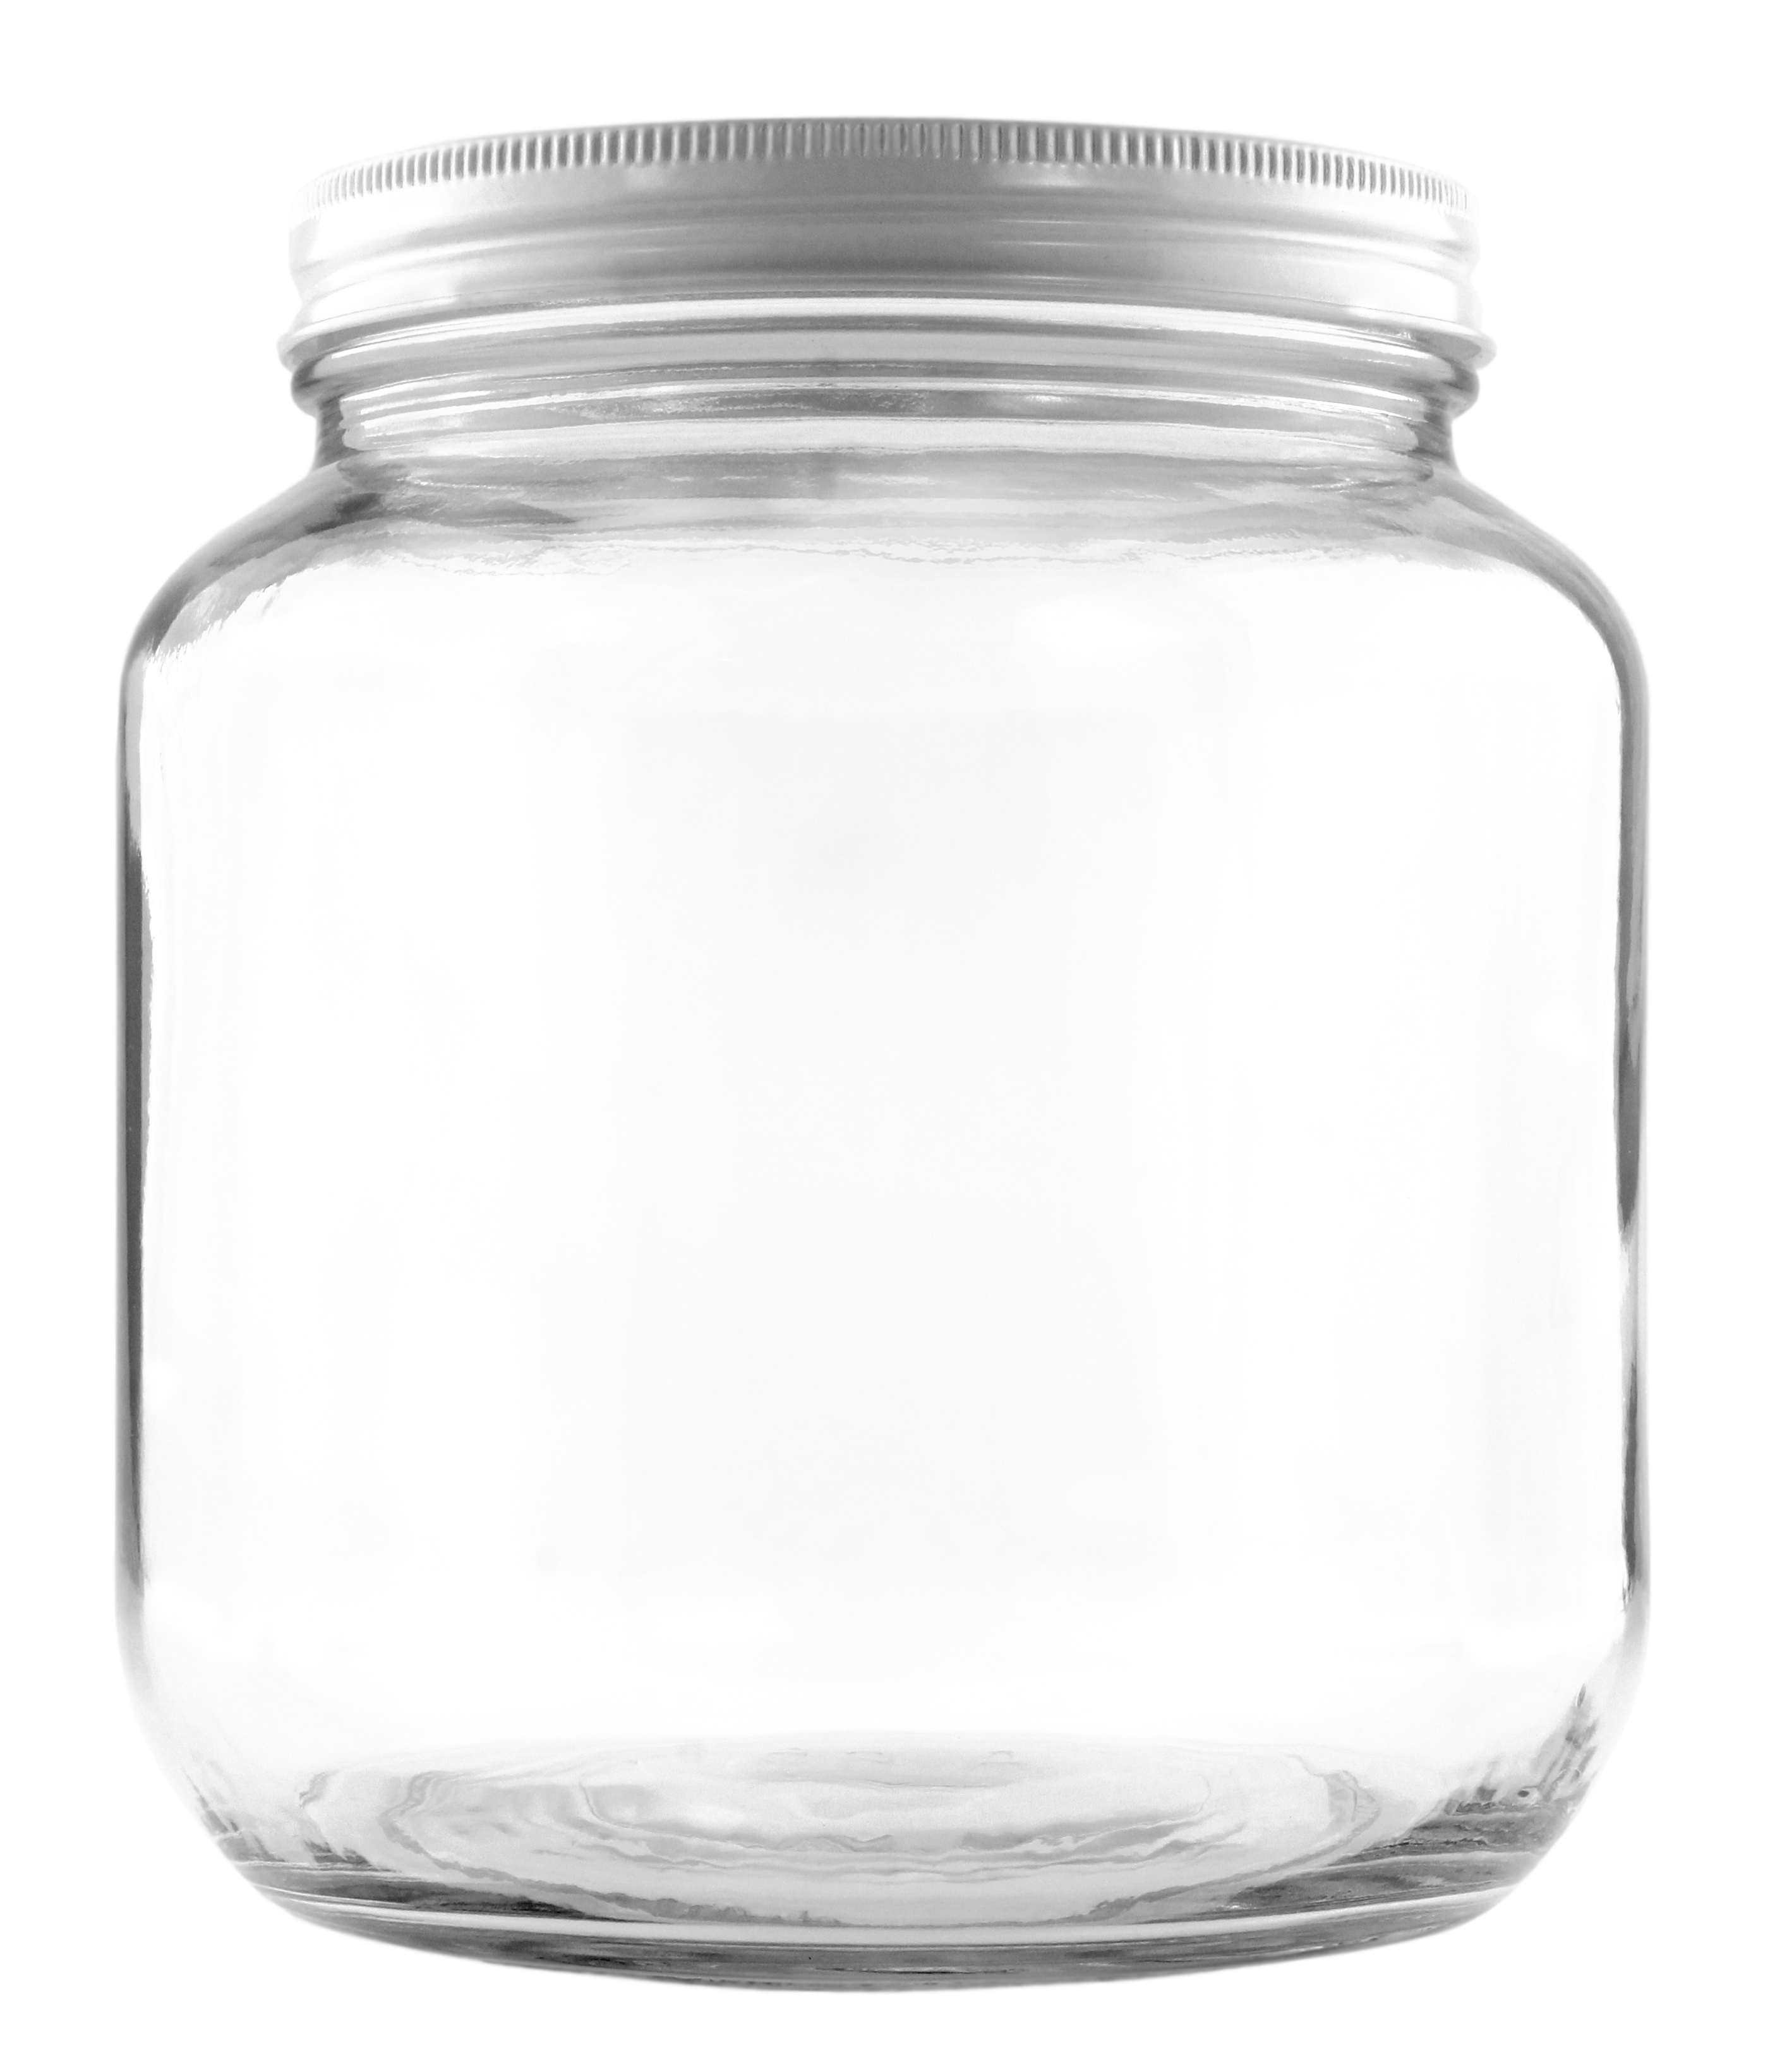 B01FMVSXHS - 64oz Clear Wide-mouth Glass Jar, BPA free Food Grade w White Metal Lid (Half Gallon) 2